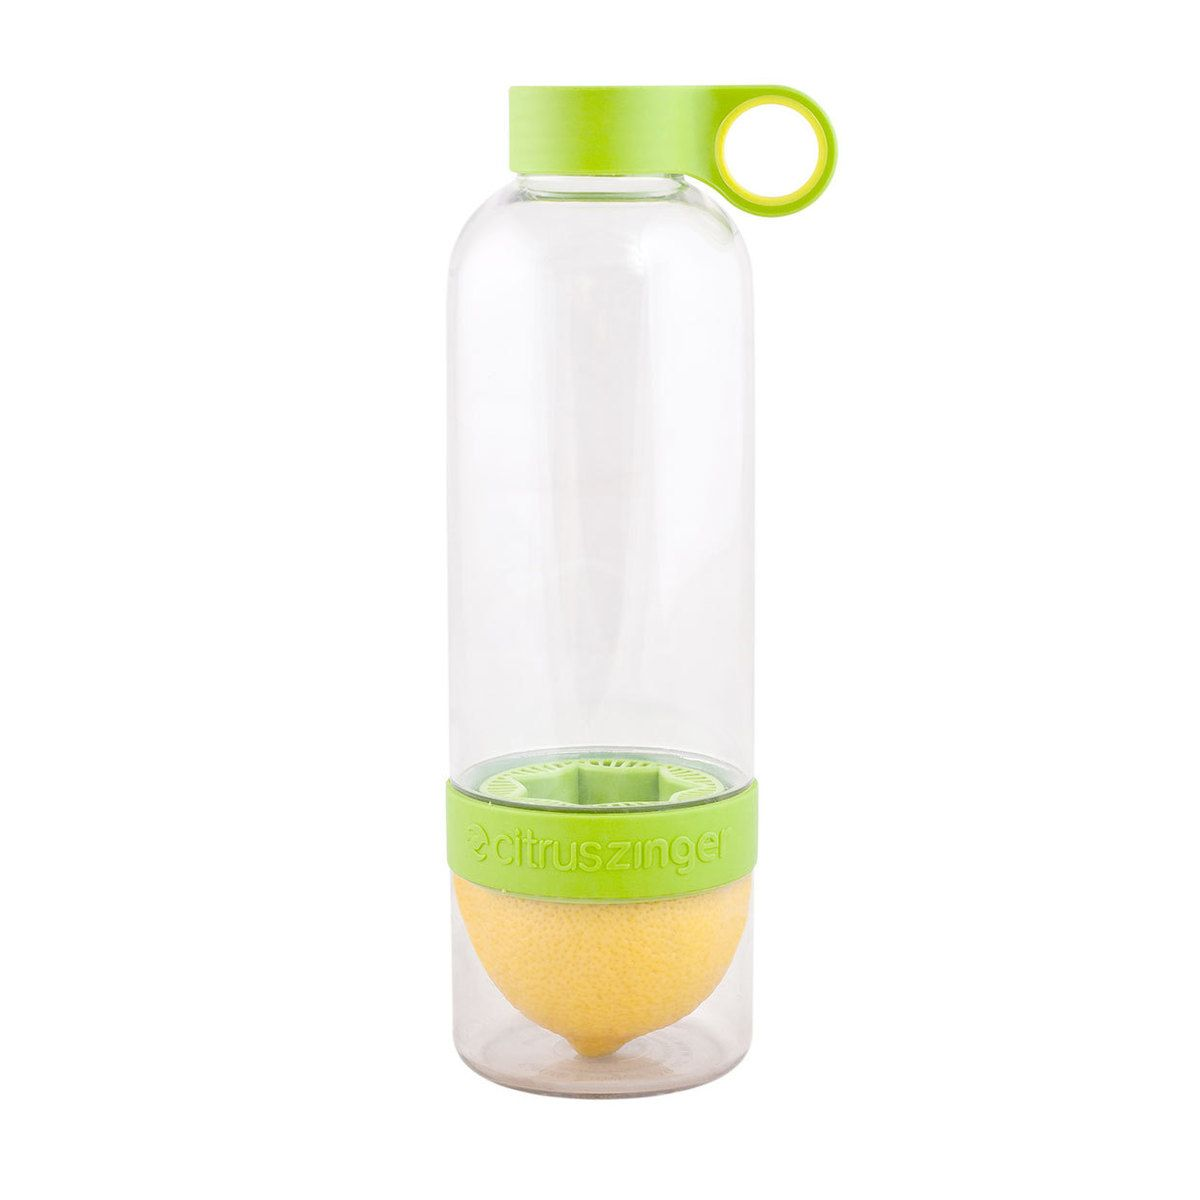 Citrus Zinger Infuser Bottle